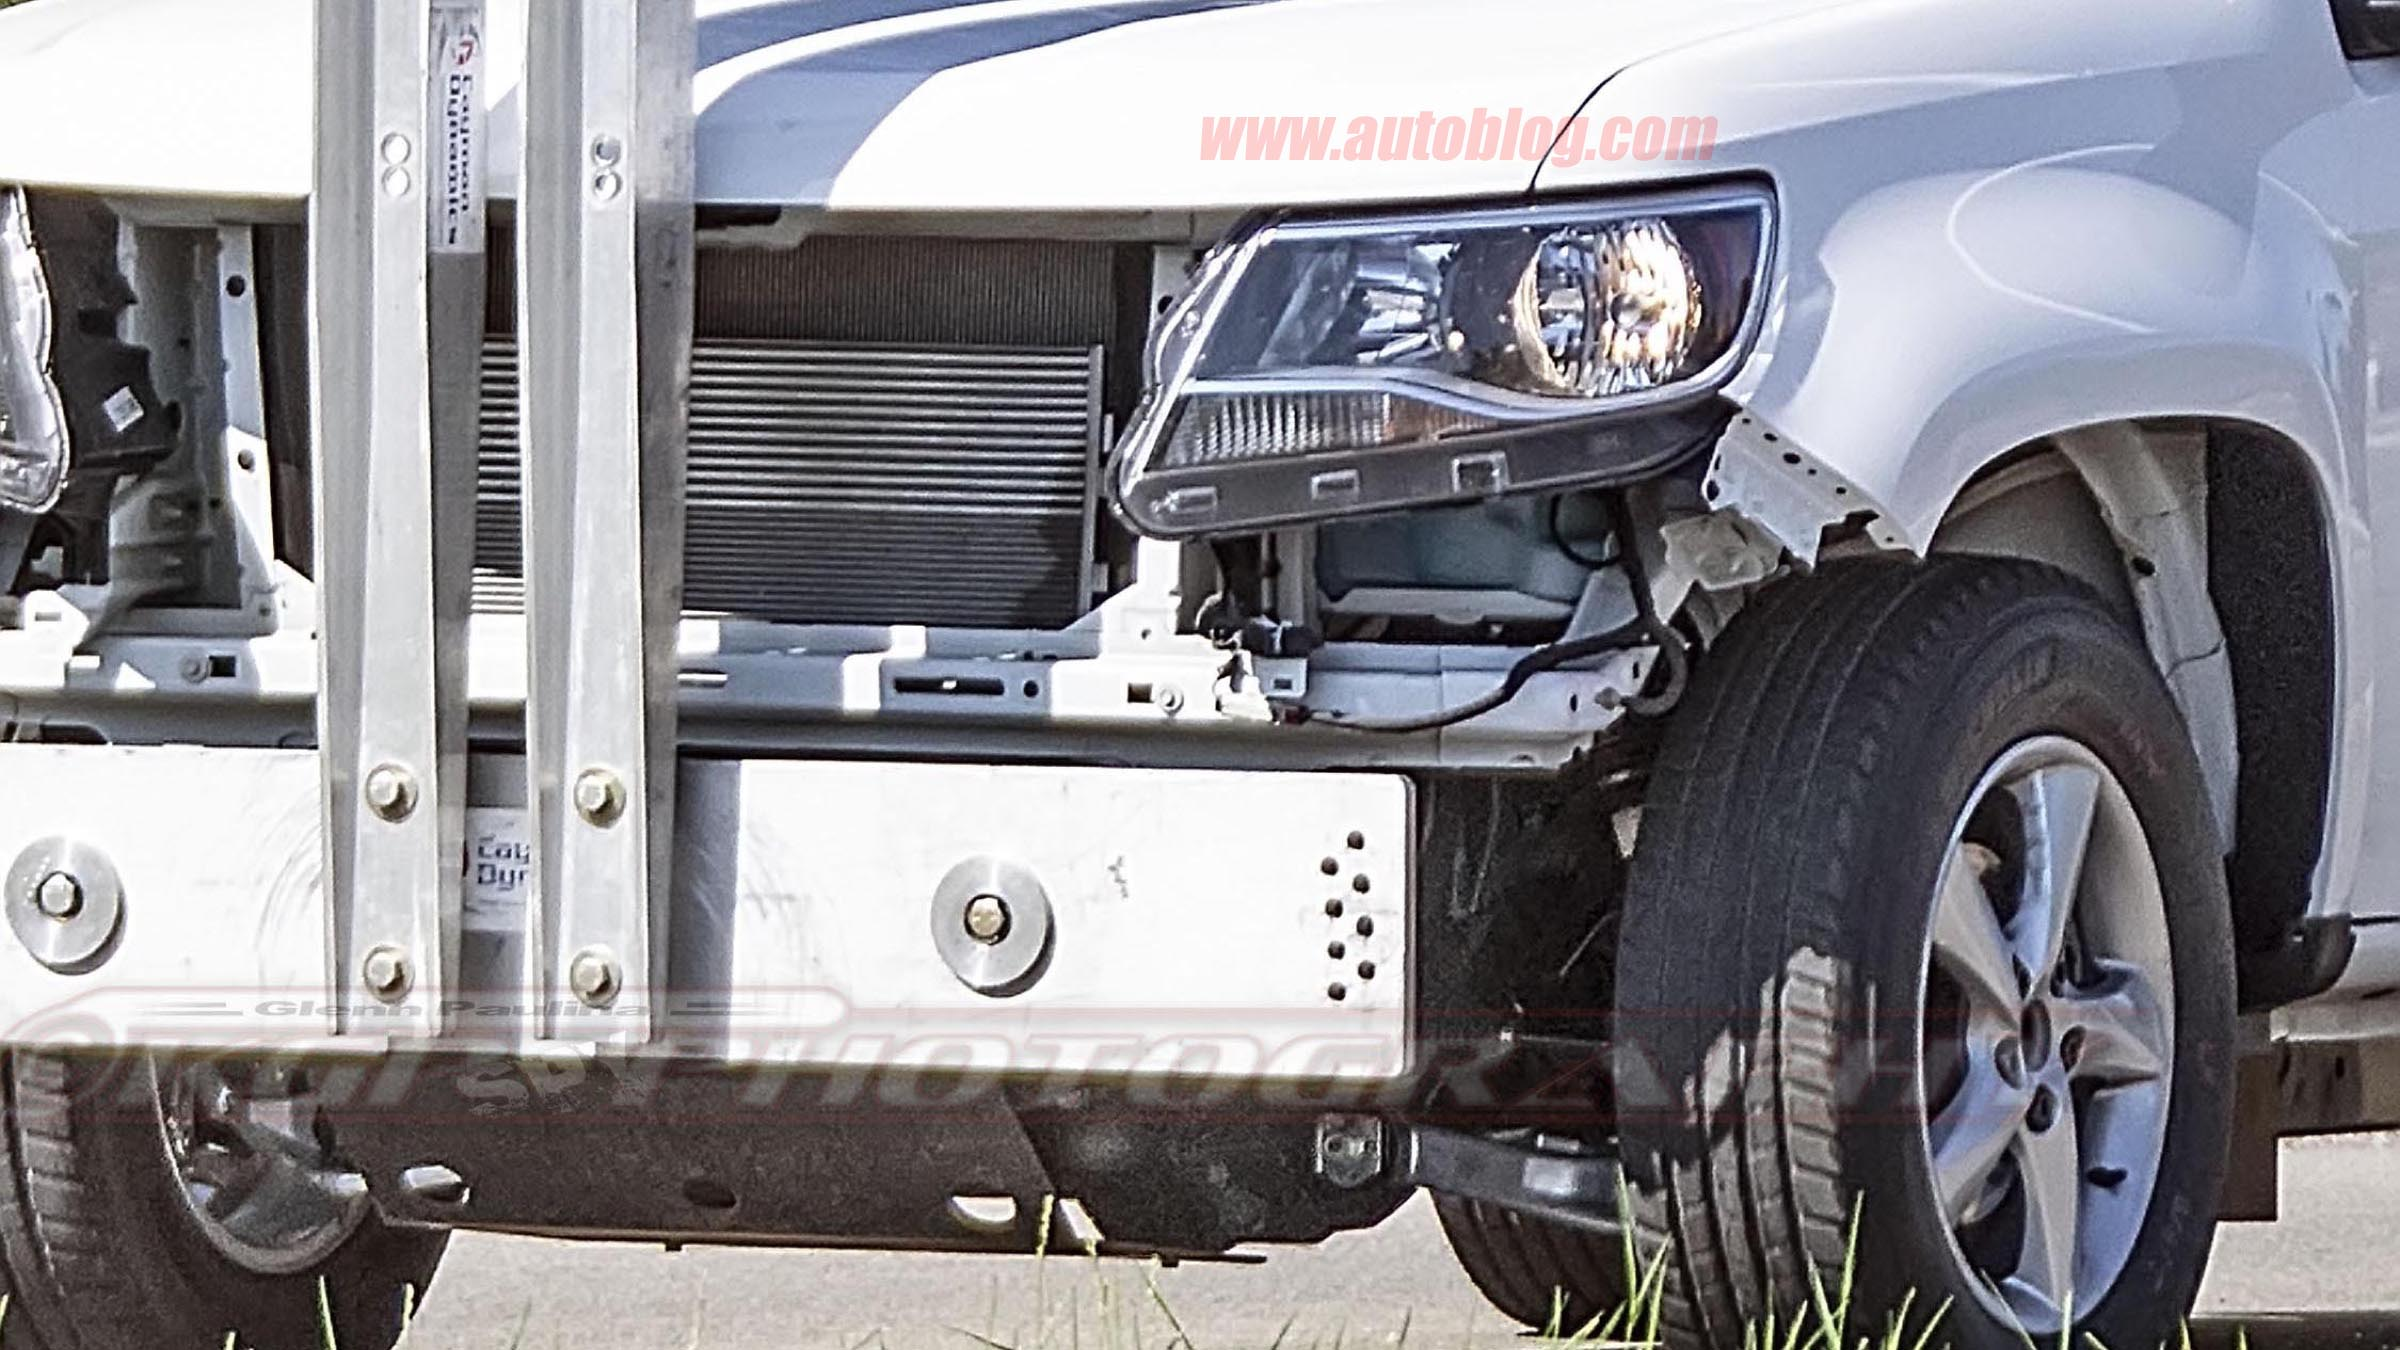 ford bronco spy shots show ford everest suspension autoblog